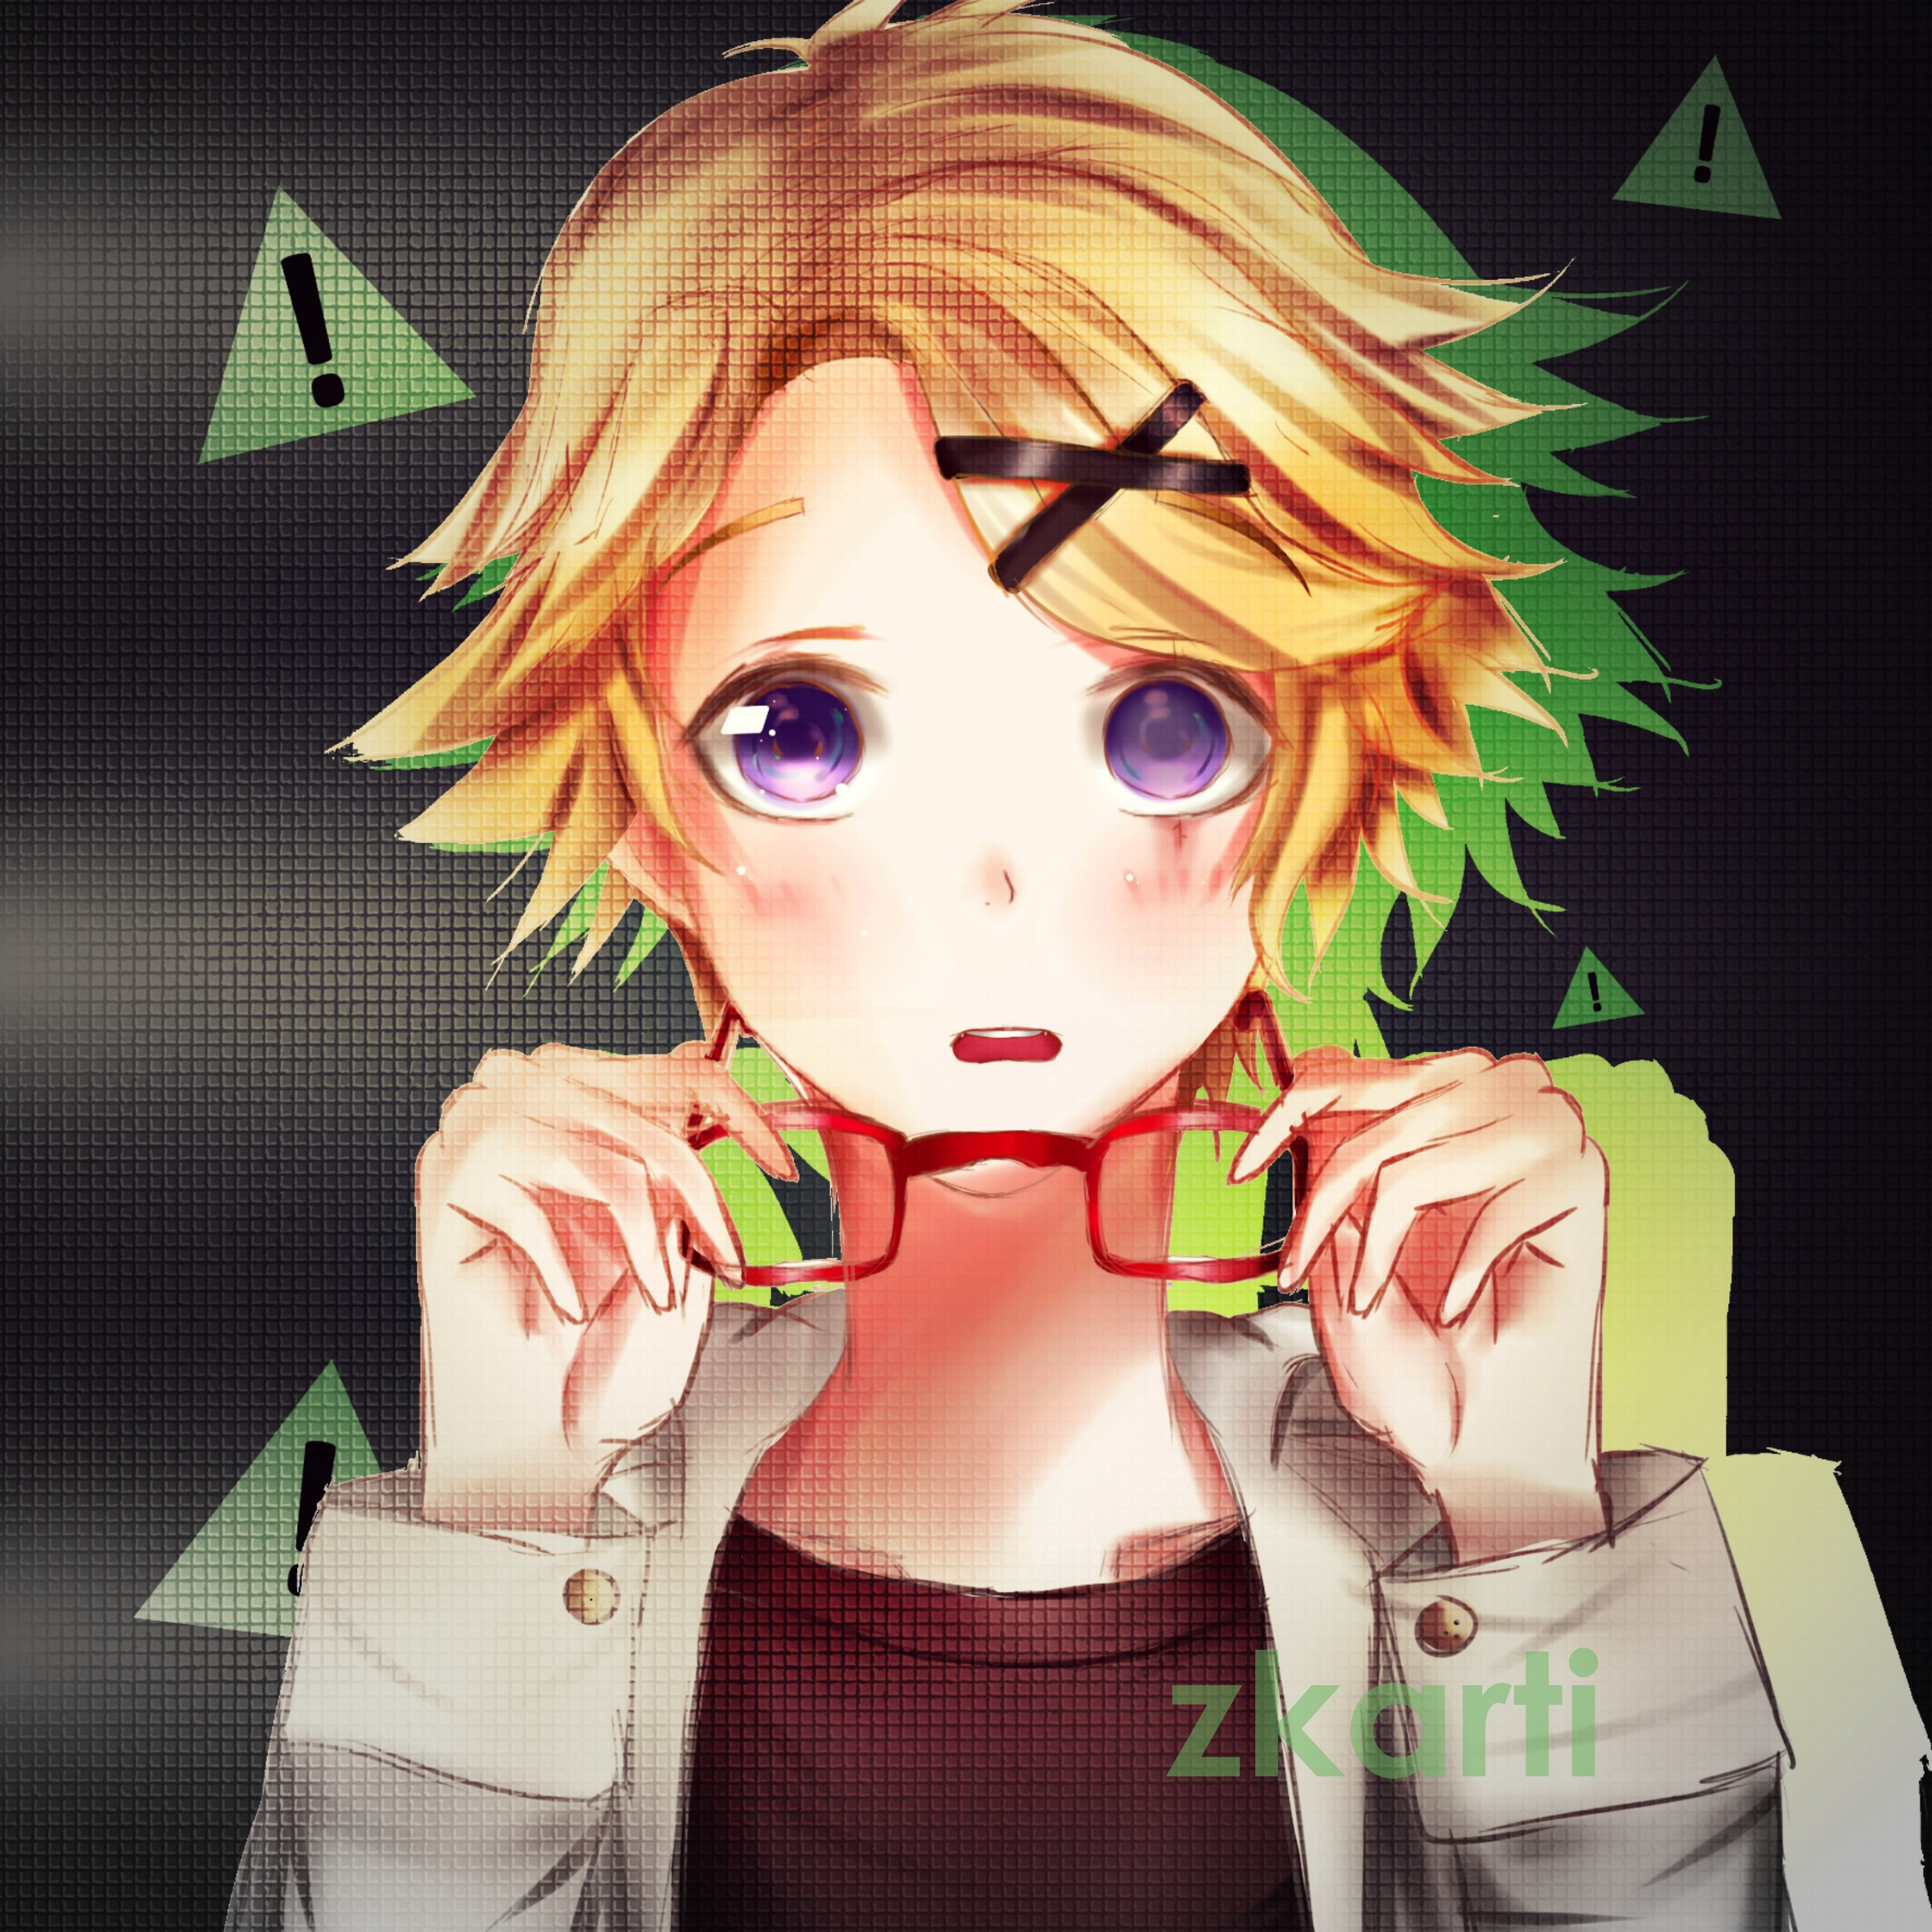 good anime dating sims Can you seize the day blog forum shimmie irc česky | deutsch | español | english | suomi | français | magyar italiano | 日本語 | 한국말 | português | 中文(简体) | 中文(繁體).